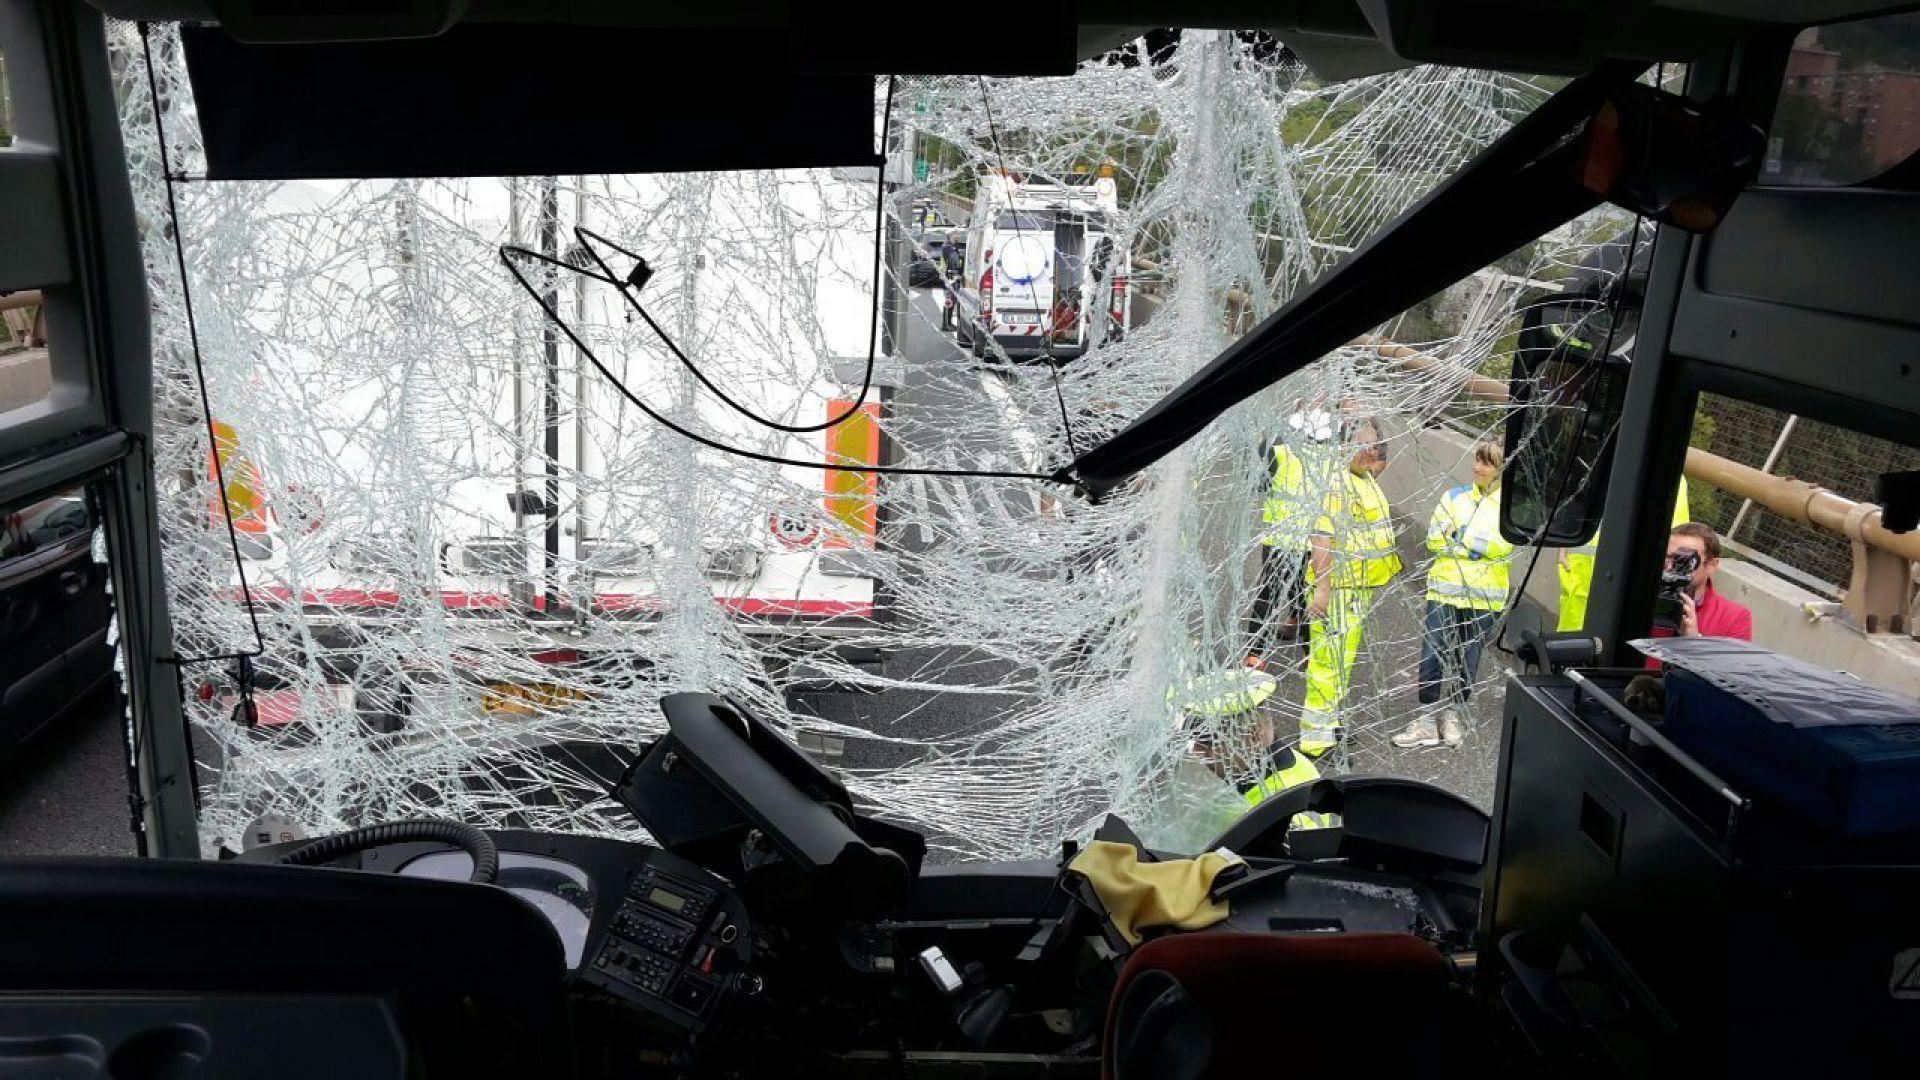 Микробус с българска регистрация катастрофира в Италия, 12 души загинаха